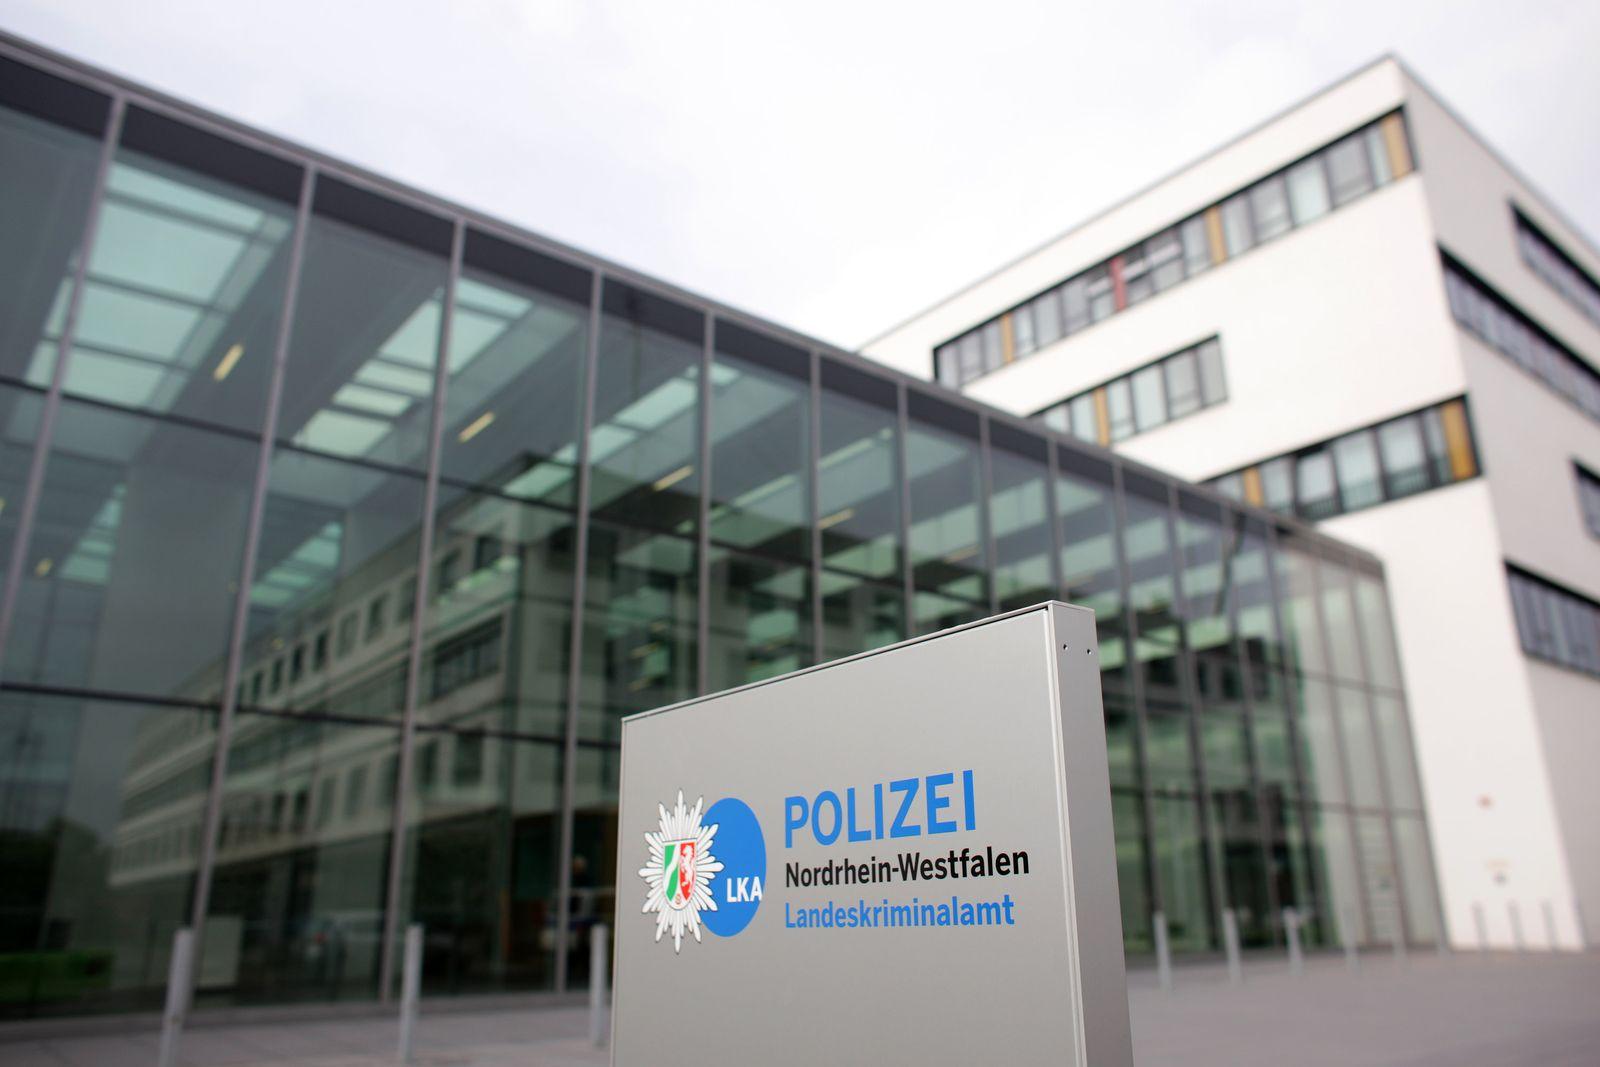 Landeskriminalamt Düsseldorf